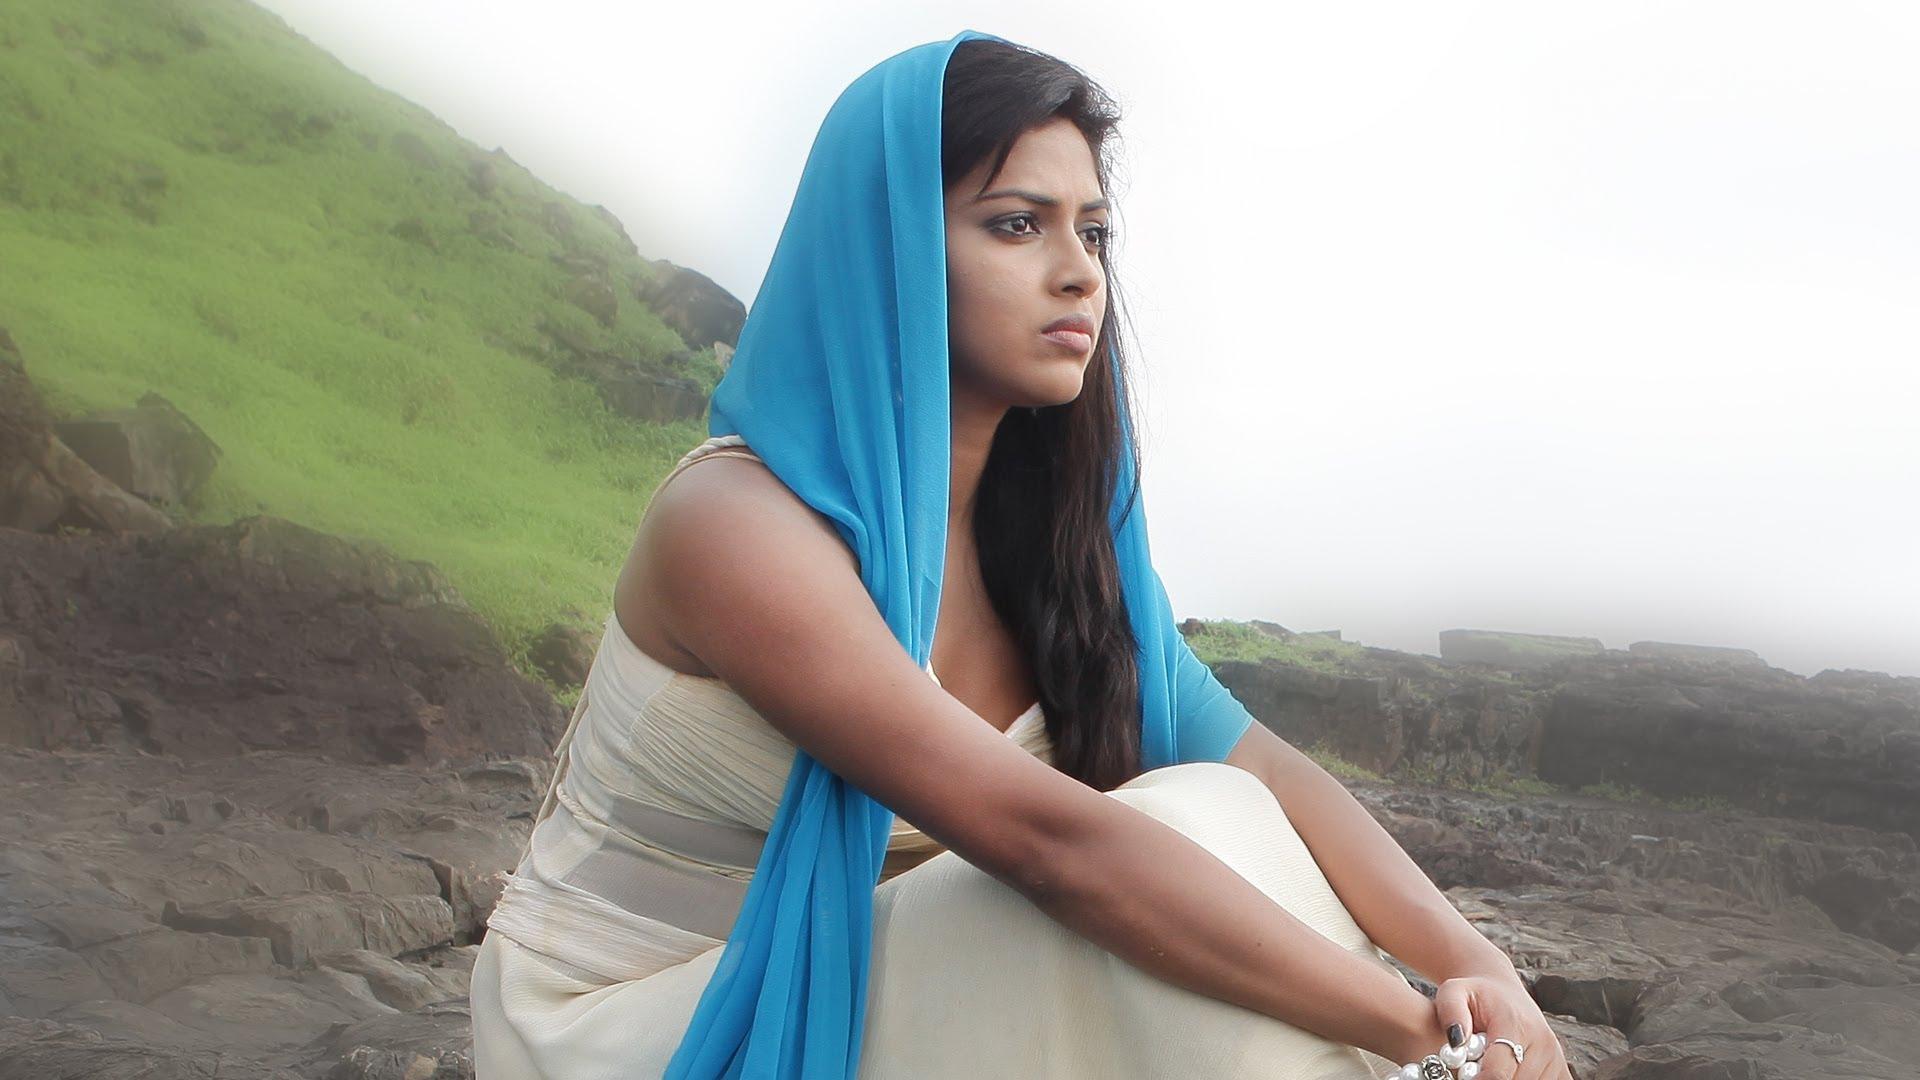 Nimirnthu Nil Tamil Movie Single Girl Photos Hd 1920x1080 Download Hd Wallpaper Wallpapertip